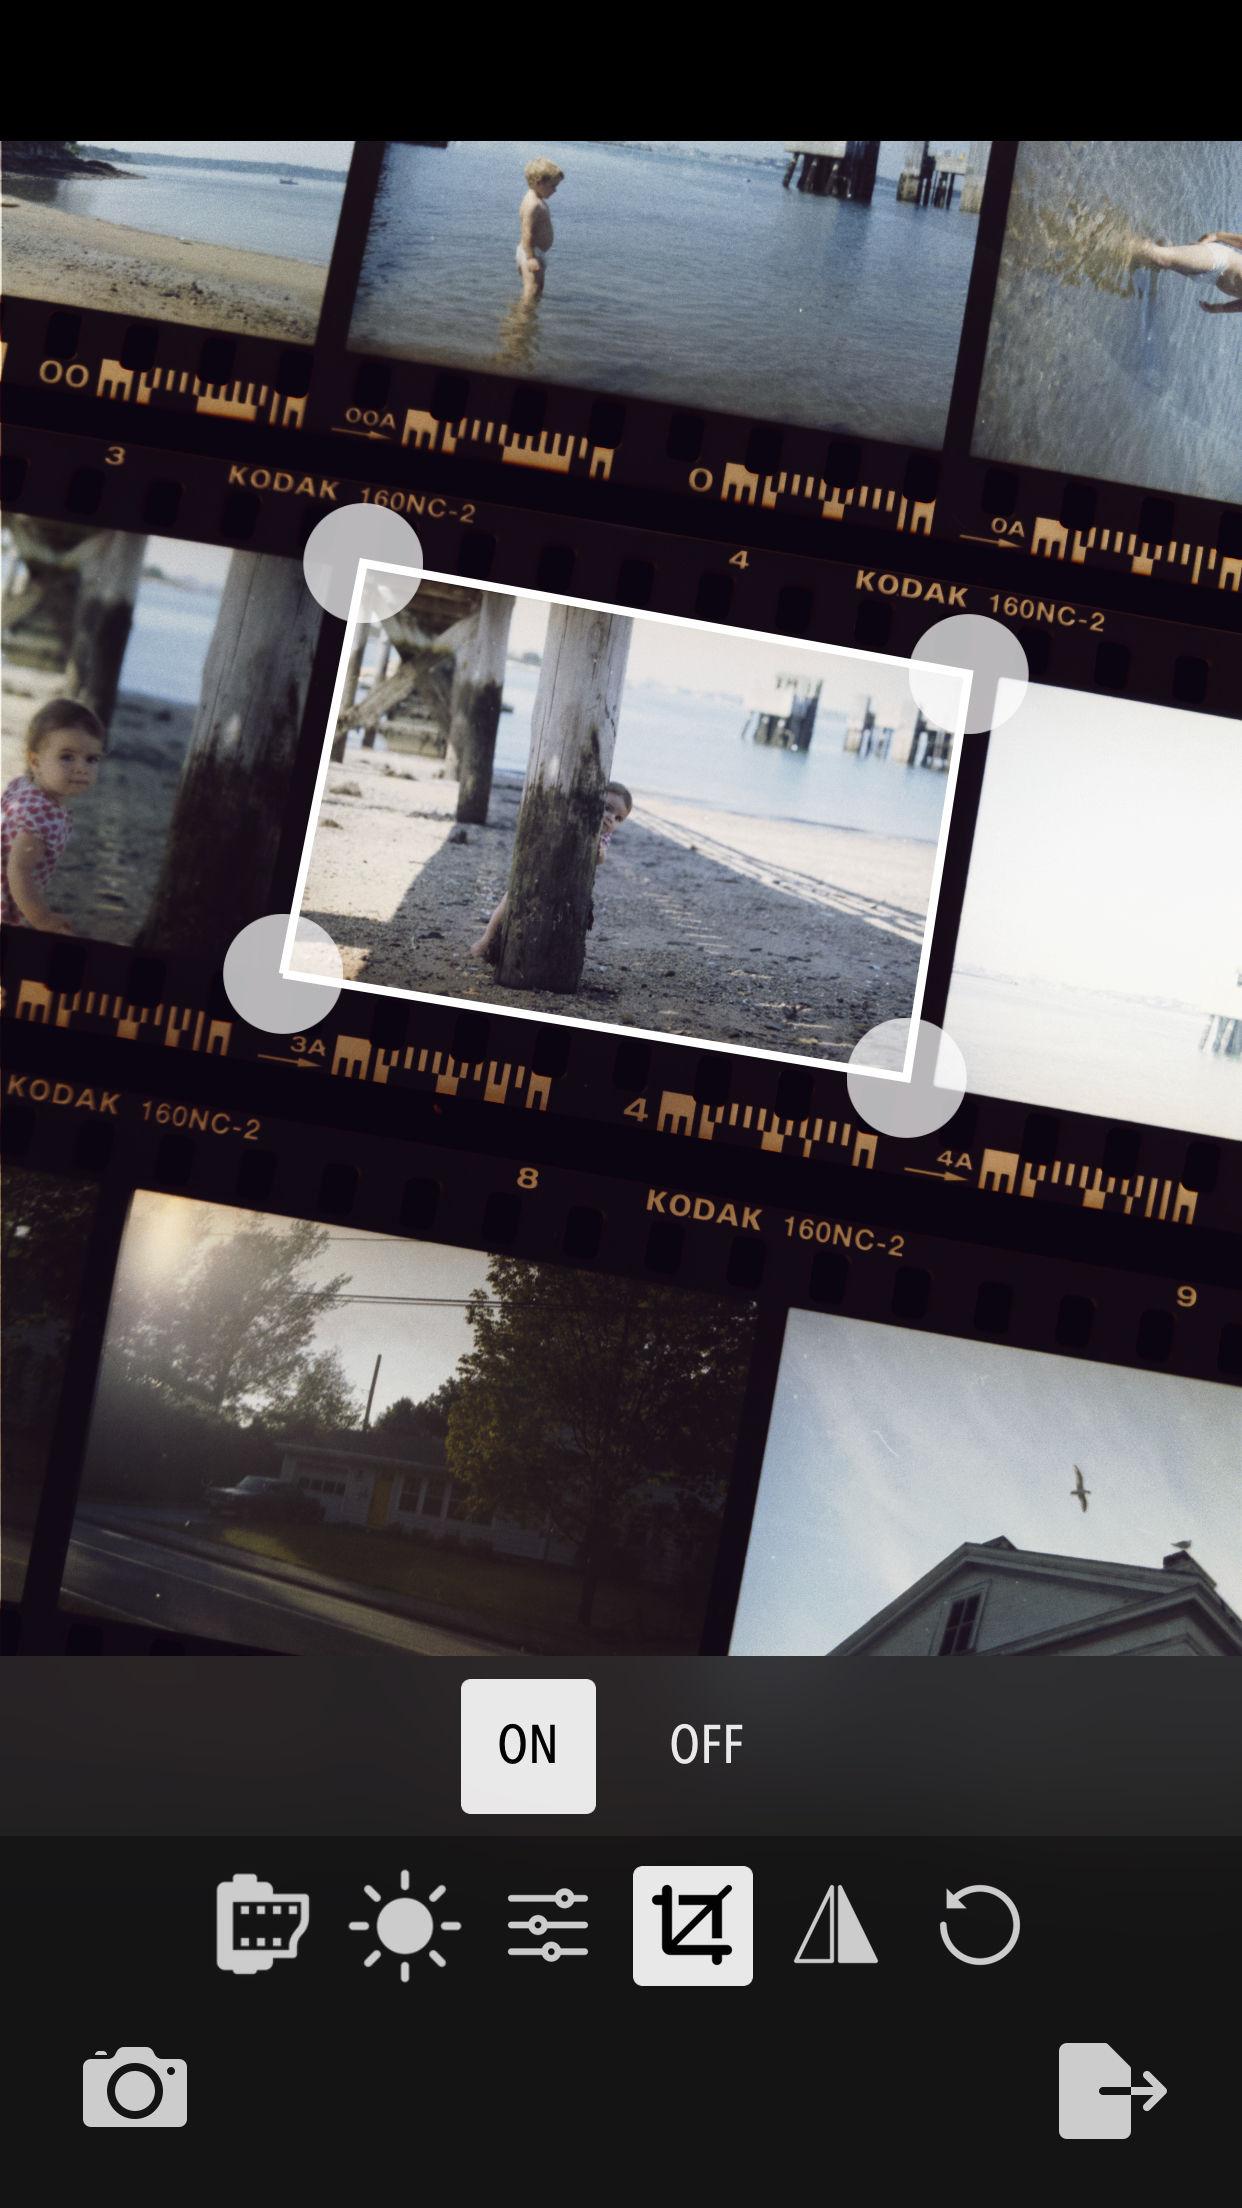 FilmLab, for analog film